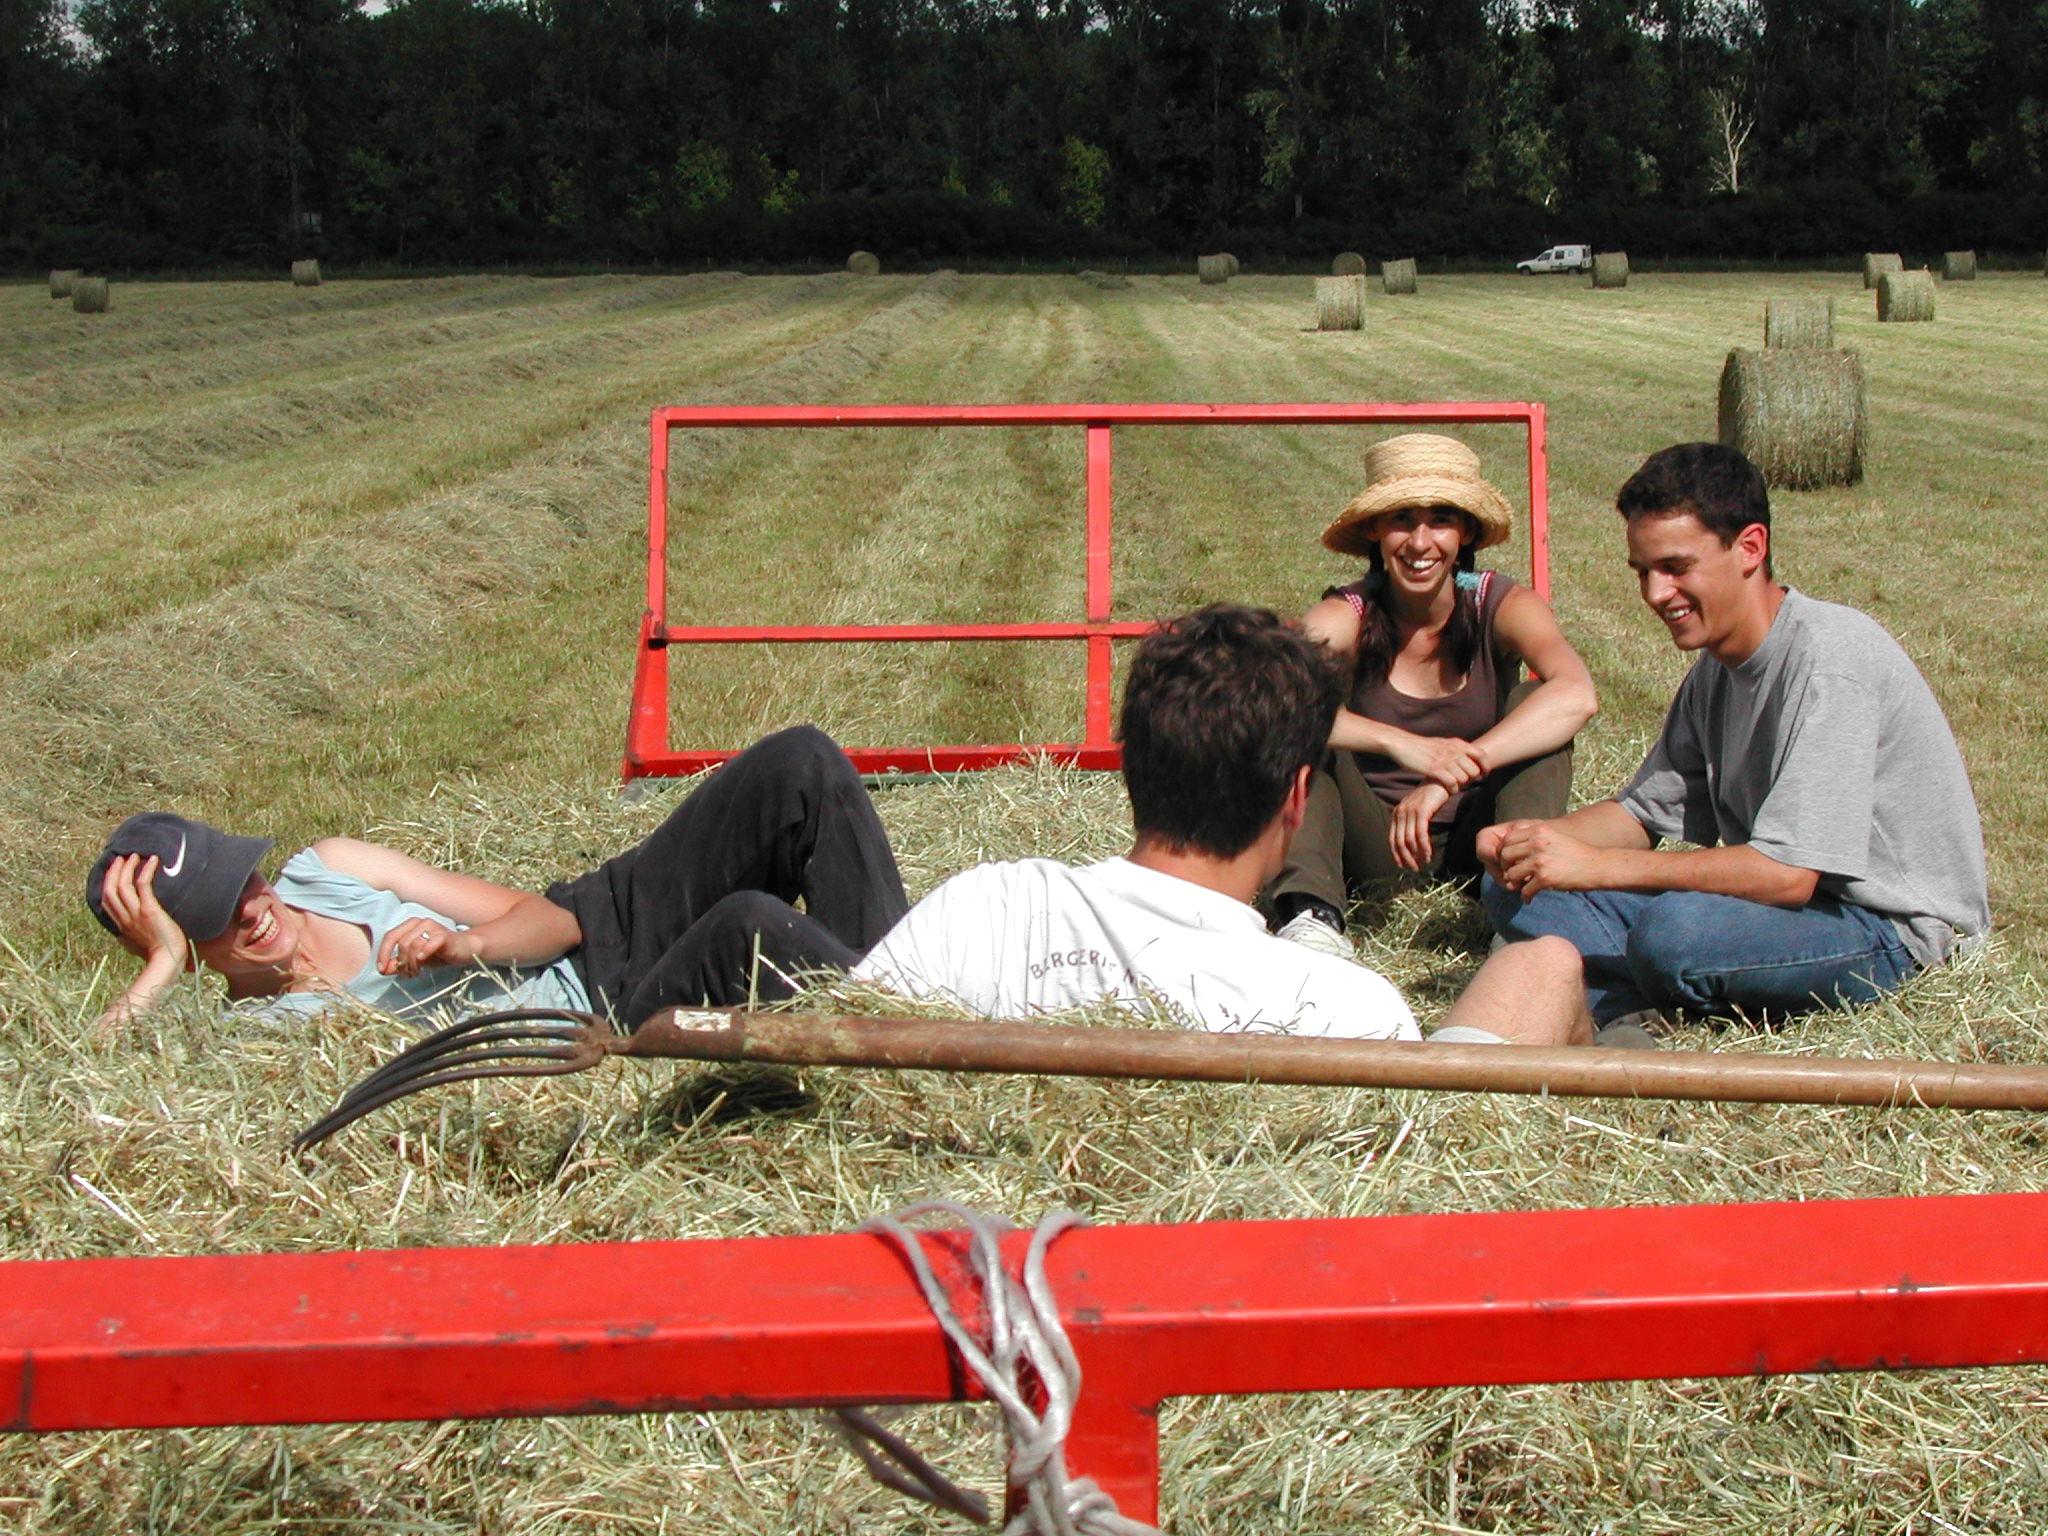 Gambar Kerja Alam Outdoor Jerami Bidang Tanah Pertanian Pedesaan Muda